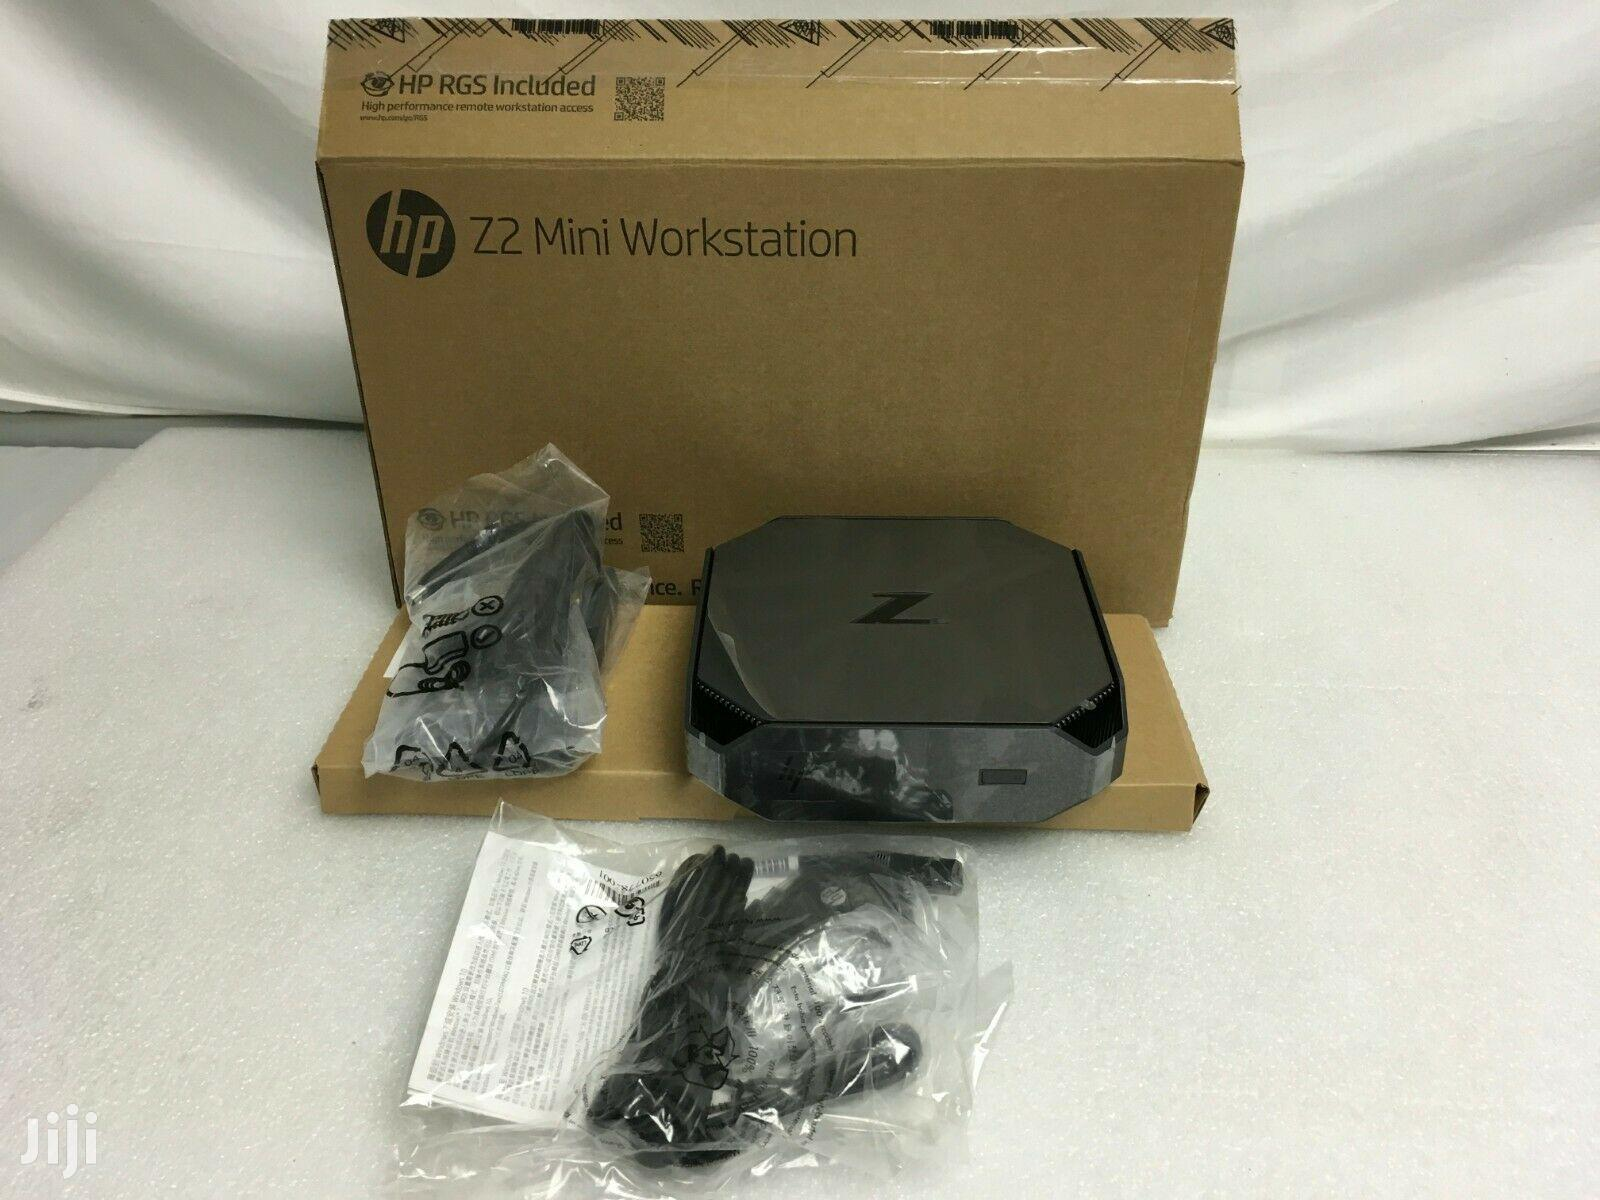 New Desktop Computer HP Z2 8GB Intel Core I7 HDD 1T